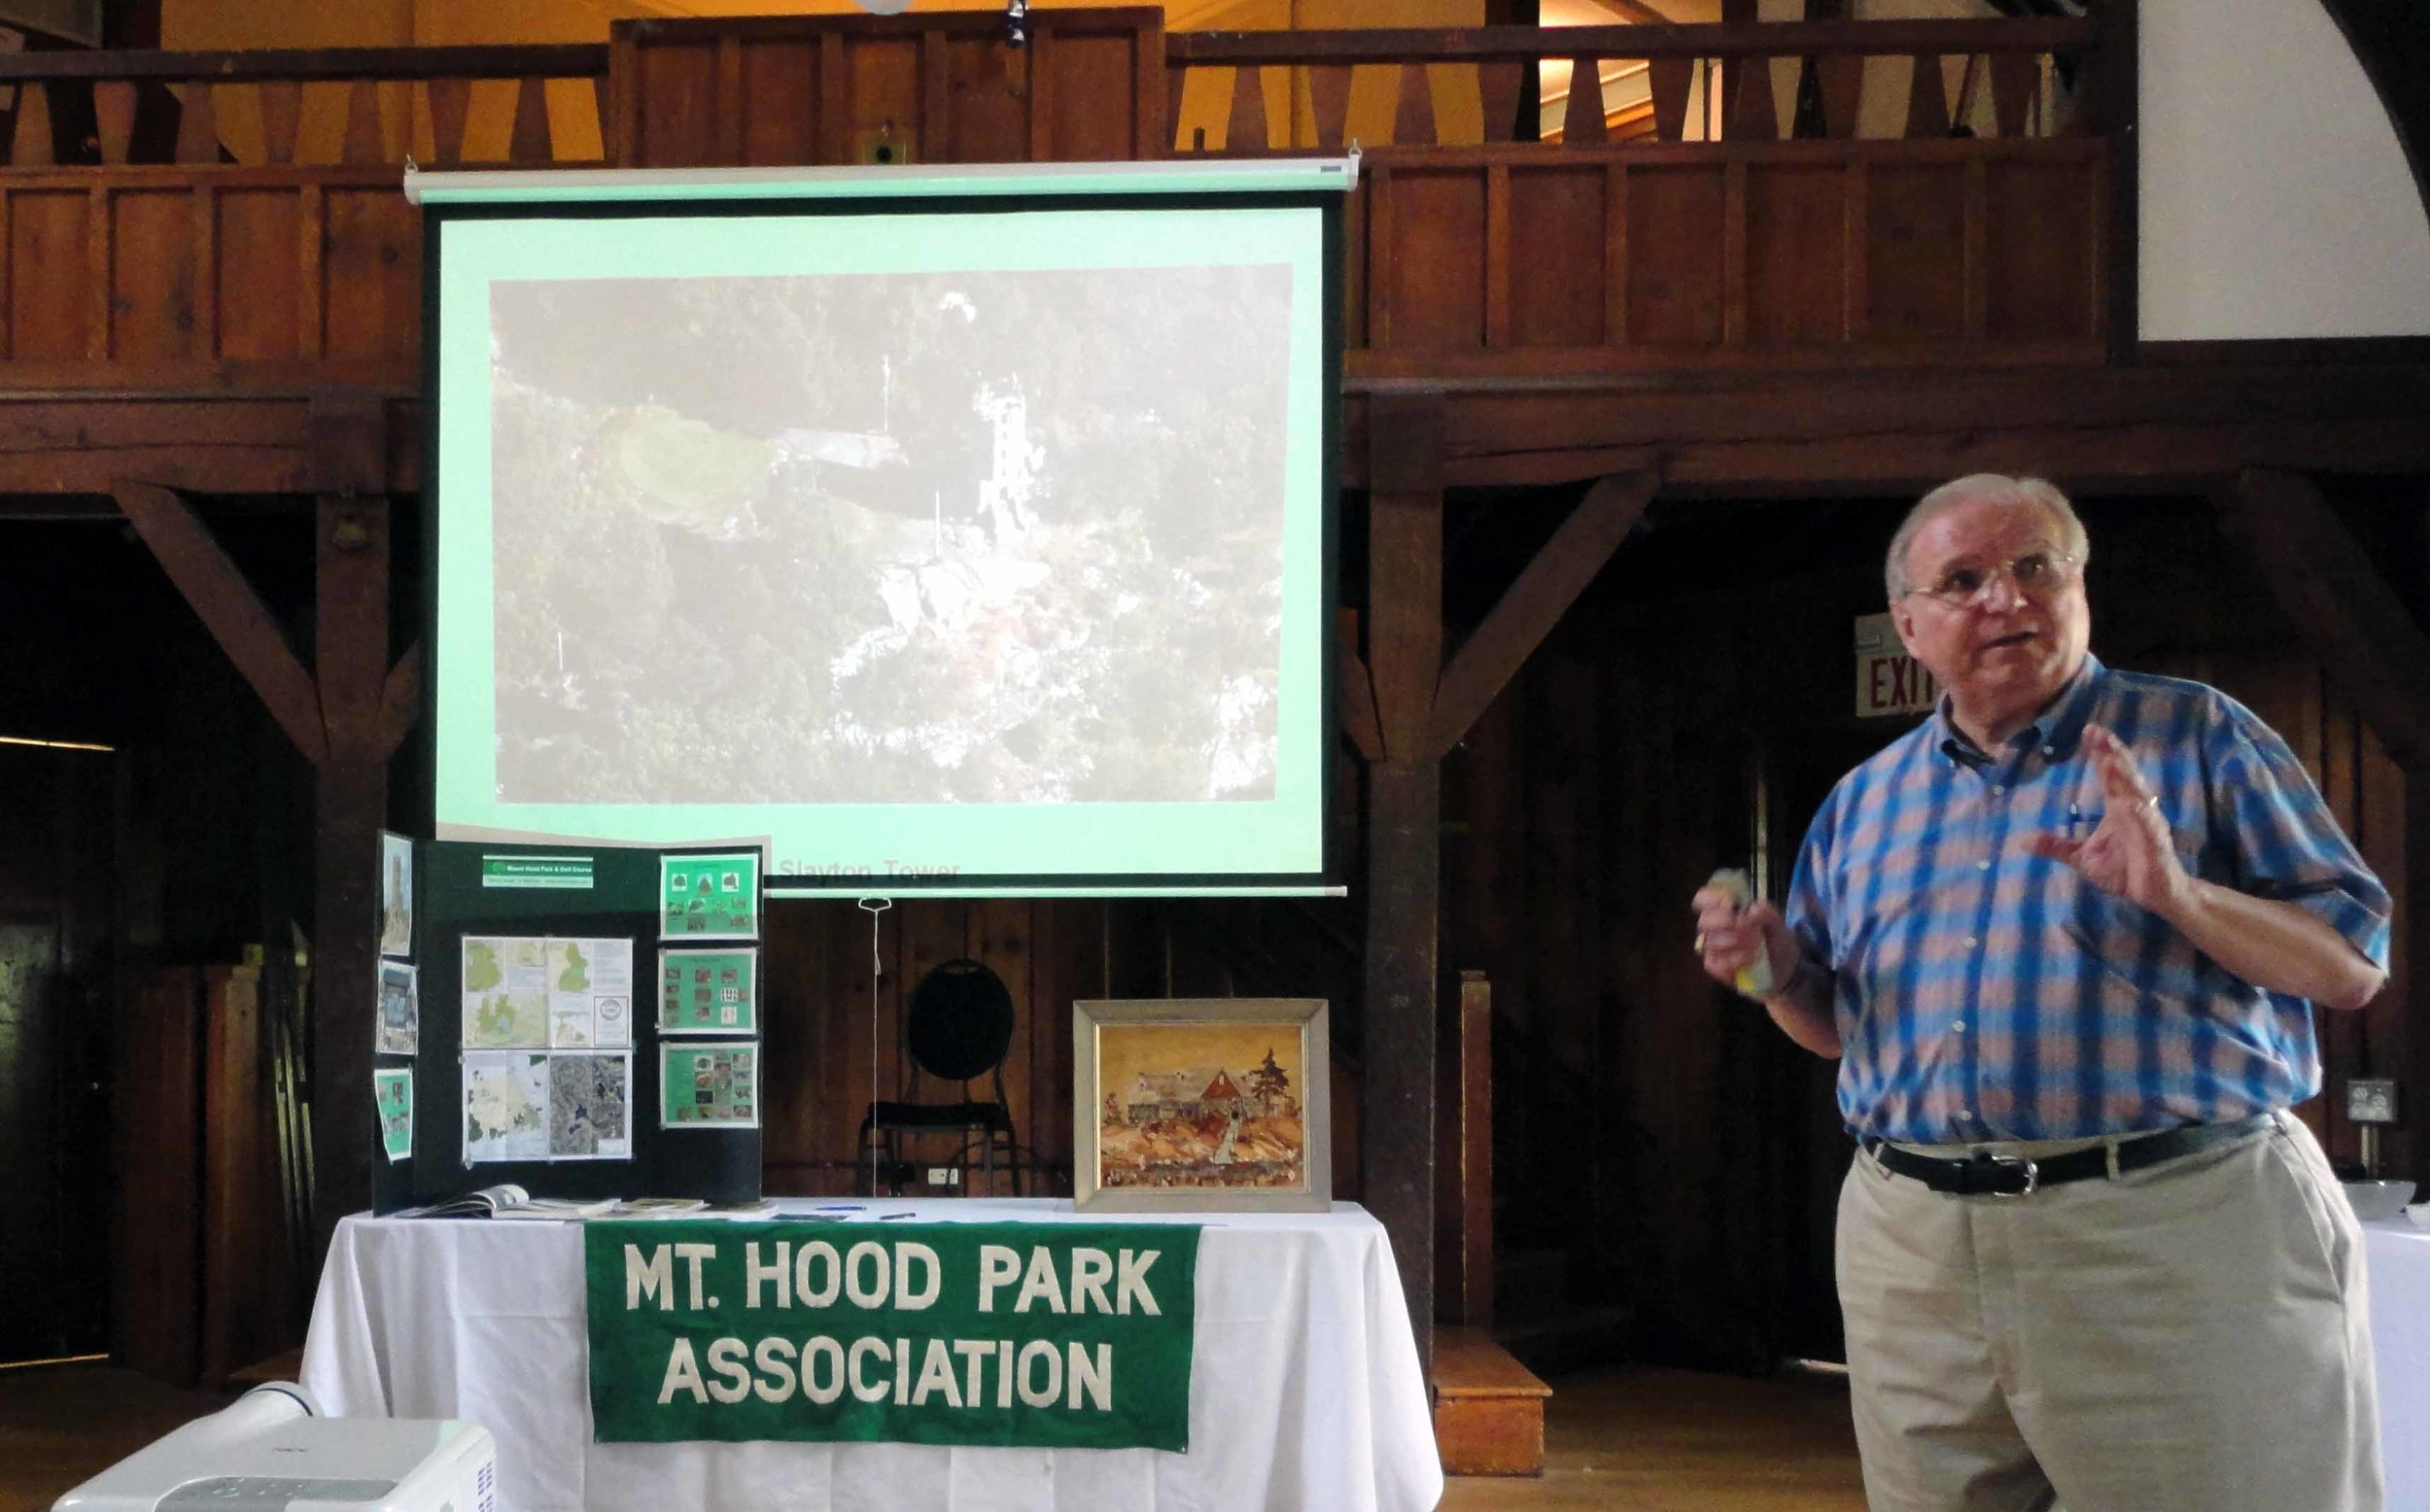 Association president Myron Dittmer, speaking to the group.